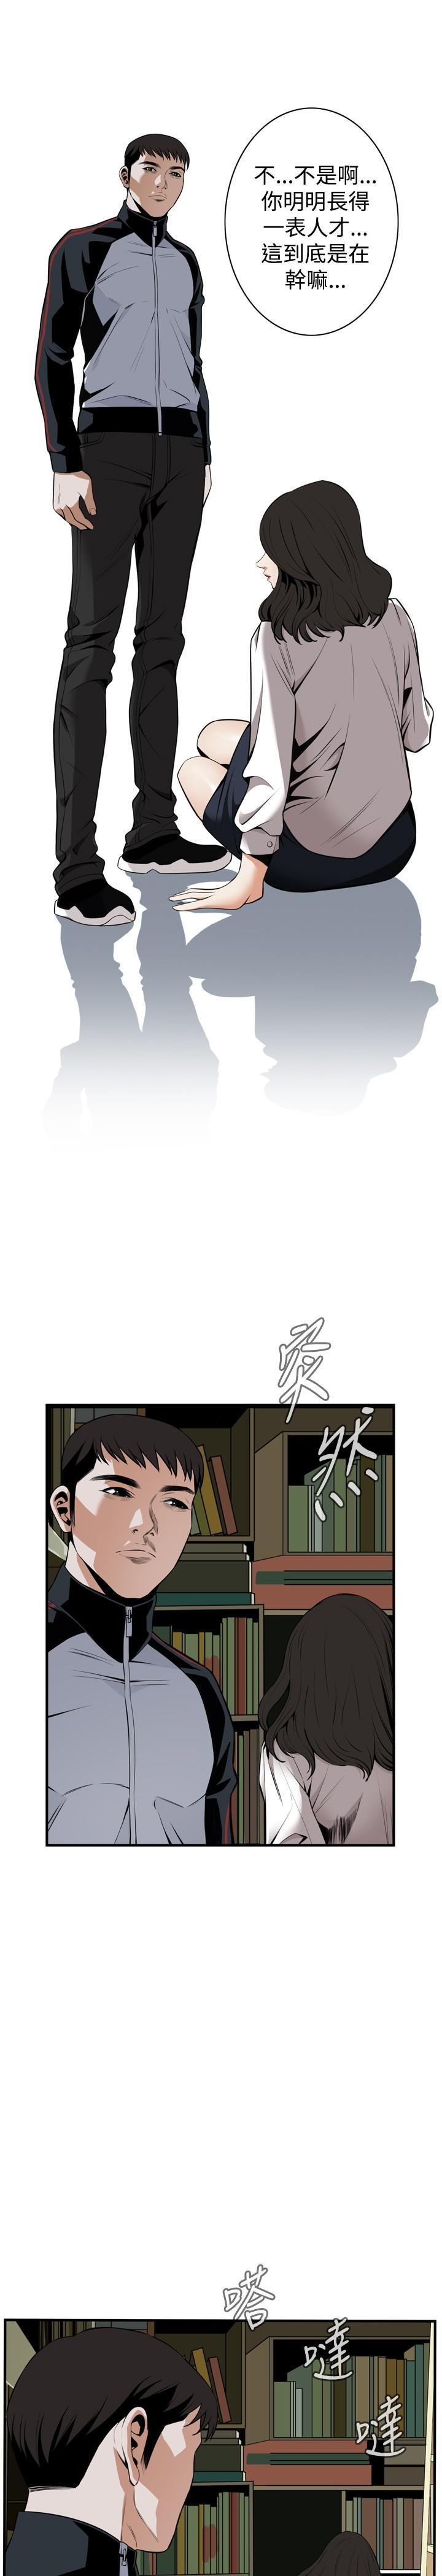 Take a Peek 偷窥 Ch.39~55 [Chinese]中文 89